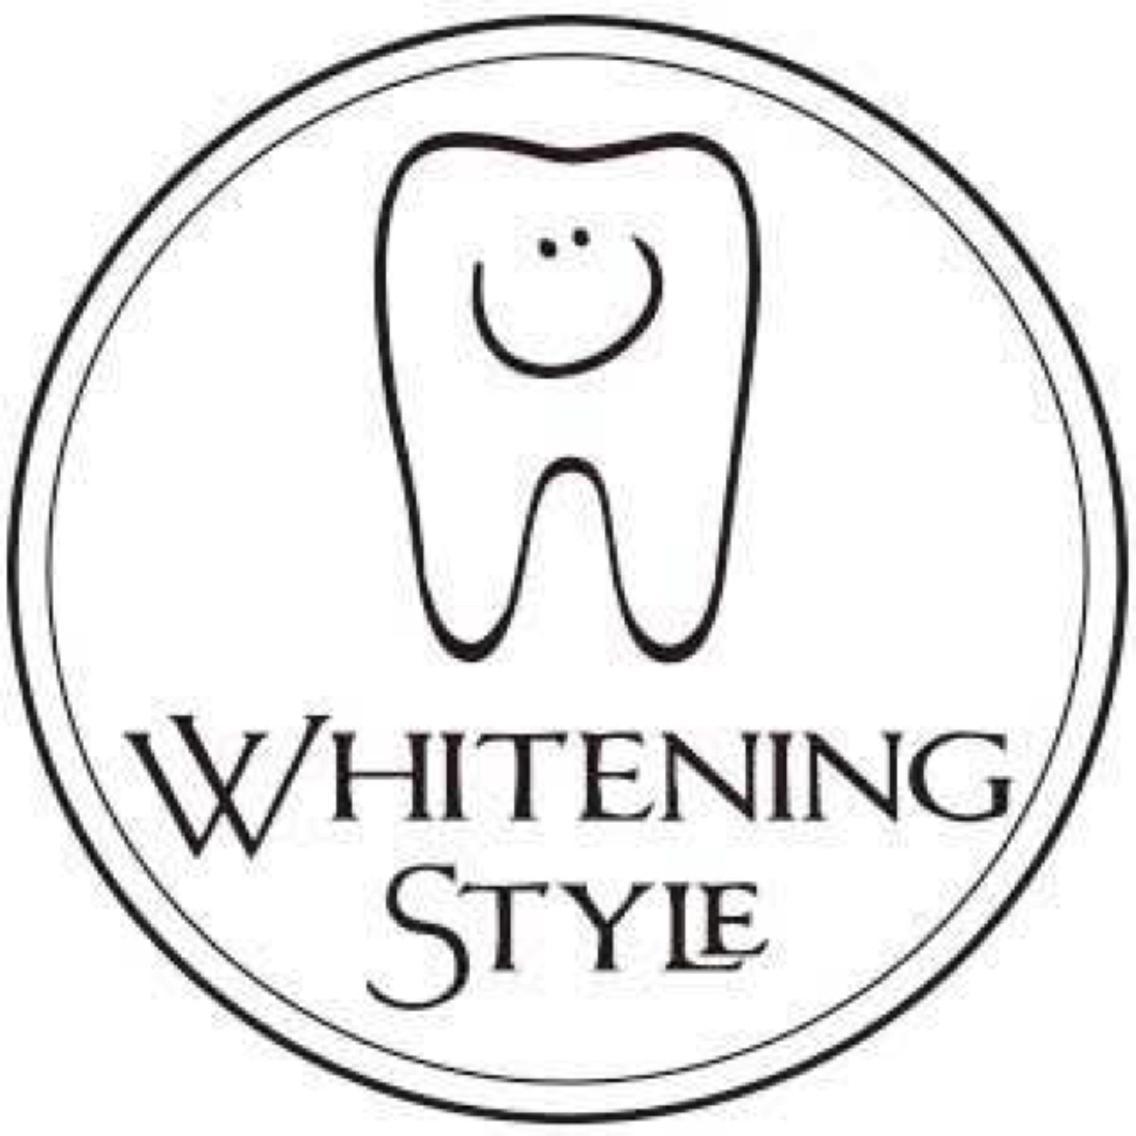 Whitening style 天神本店